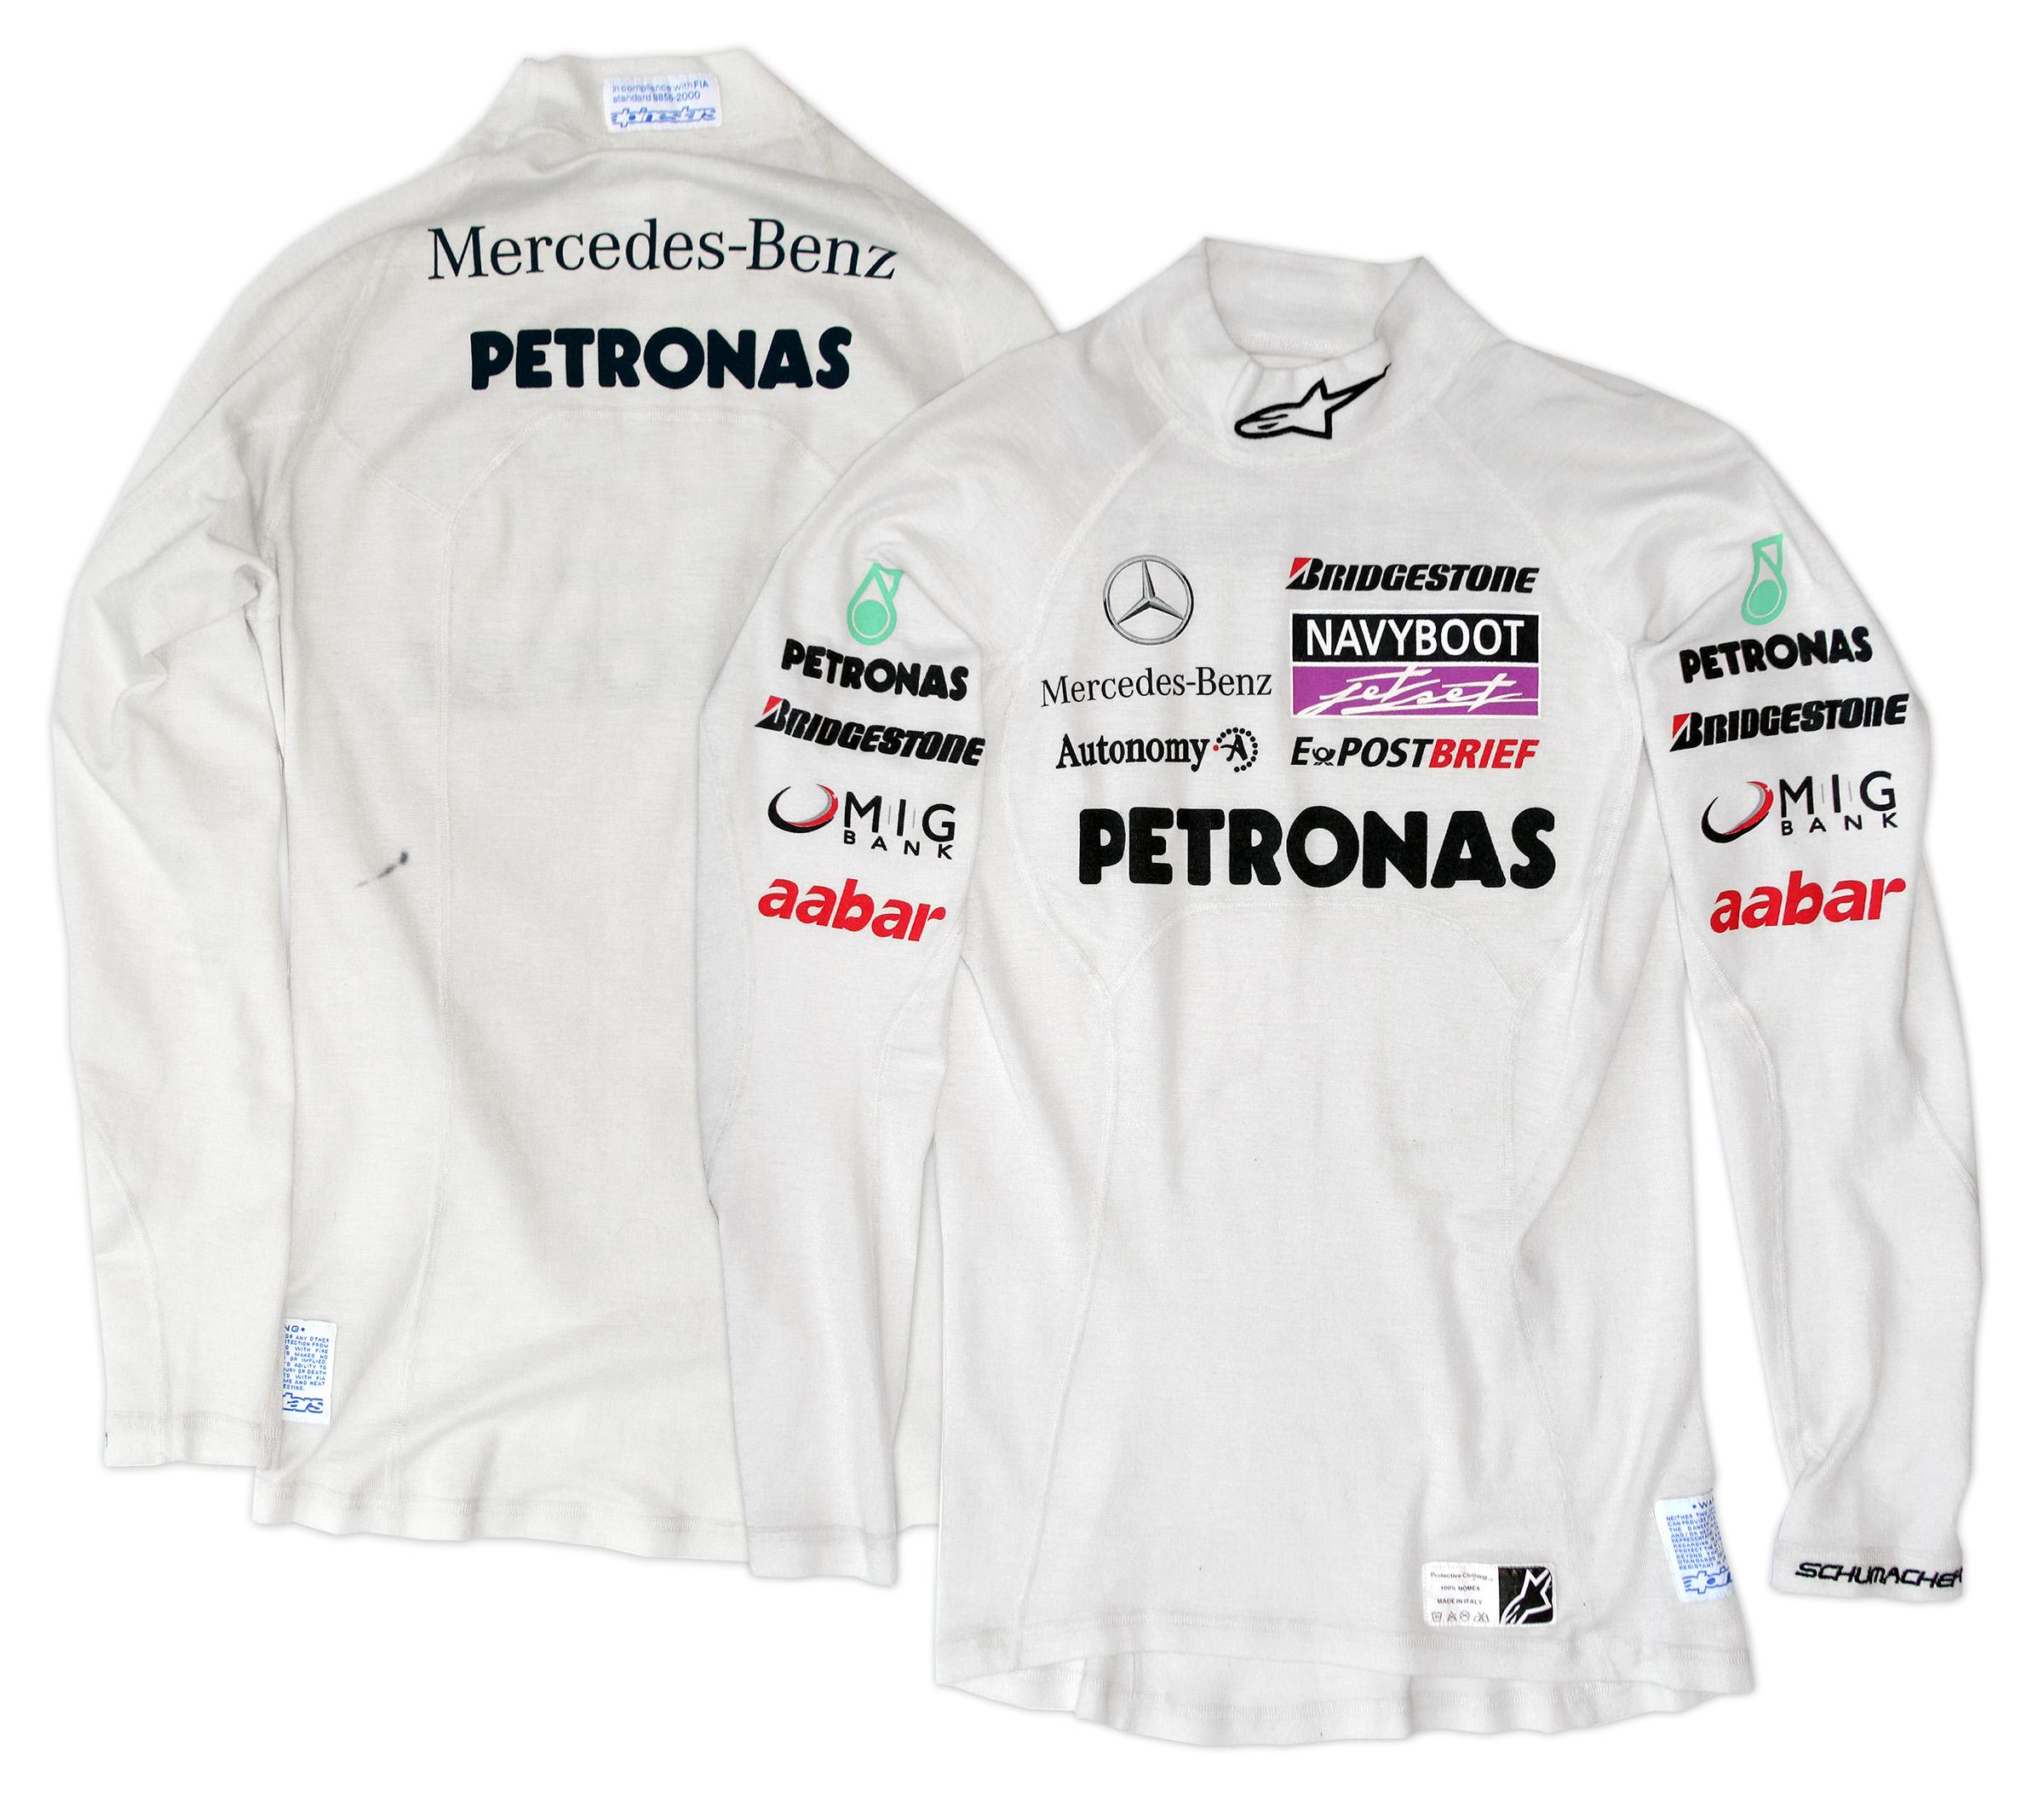 talented graphic racing creative s by car vertical shirts amg designers apparel fashionable logo women t mercedes tshirts fashion benz pin shirt